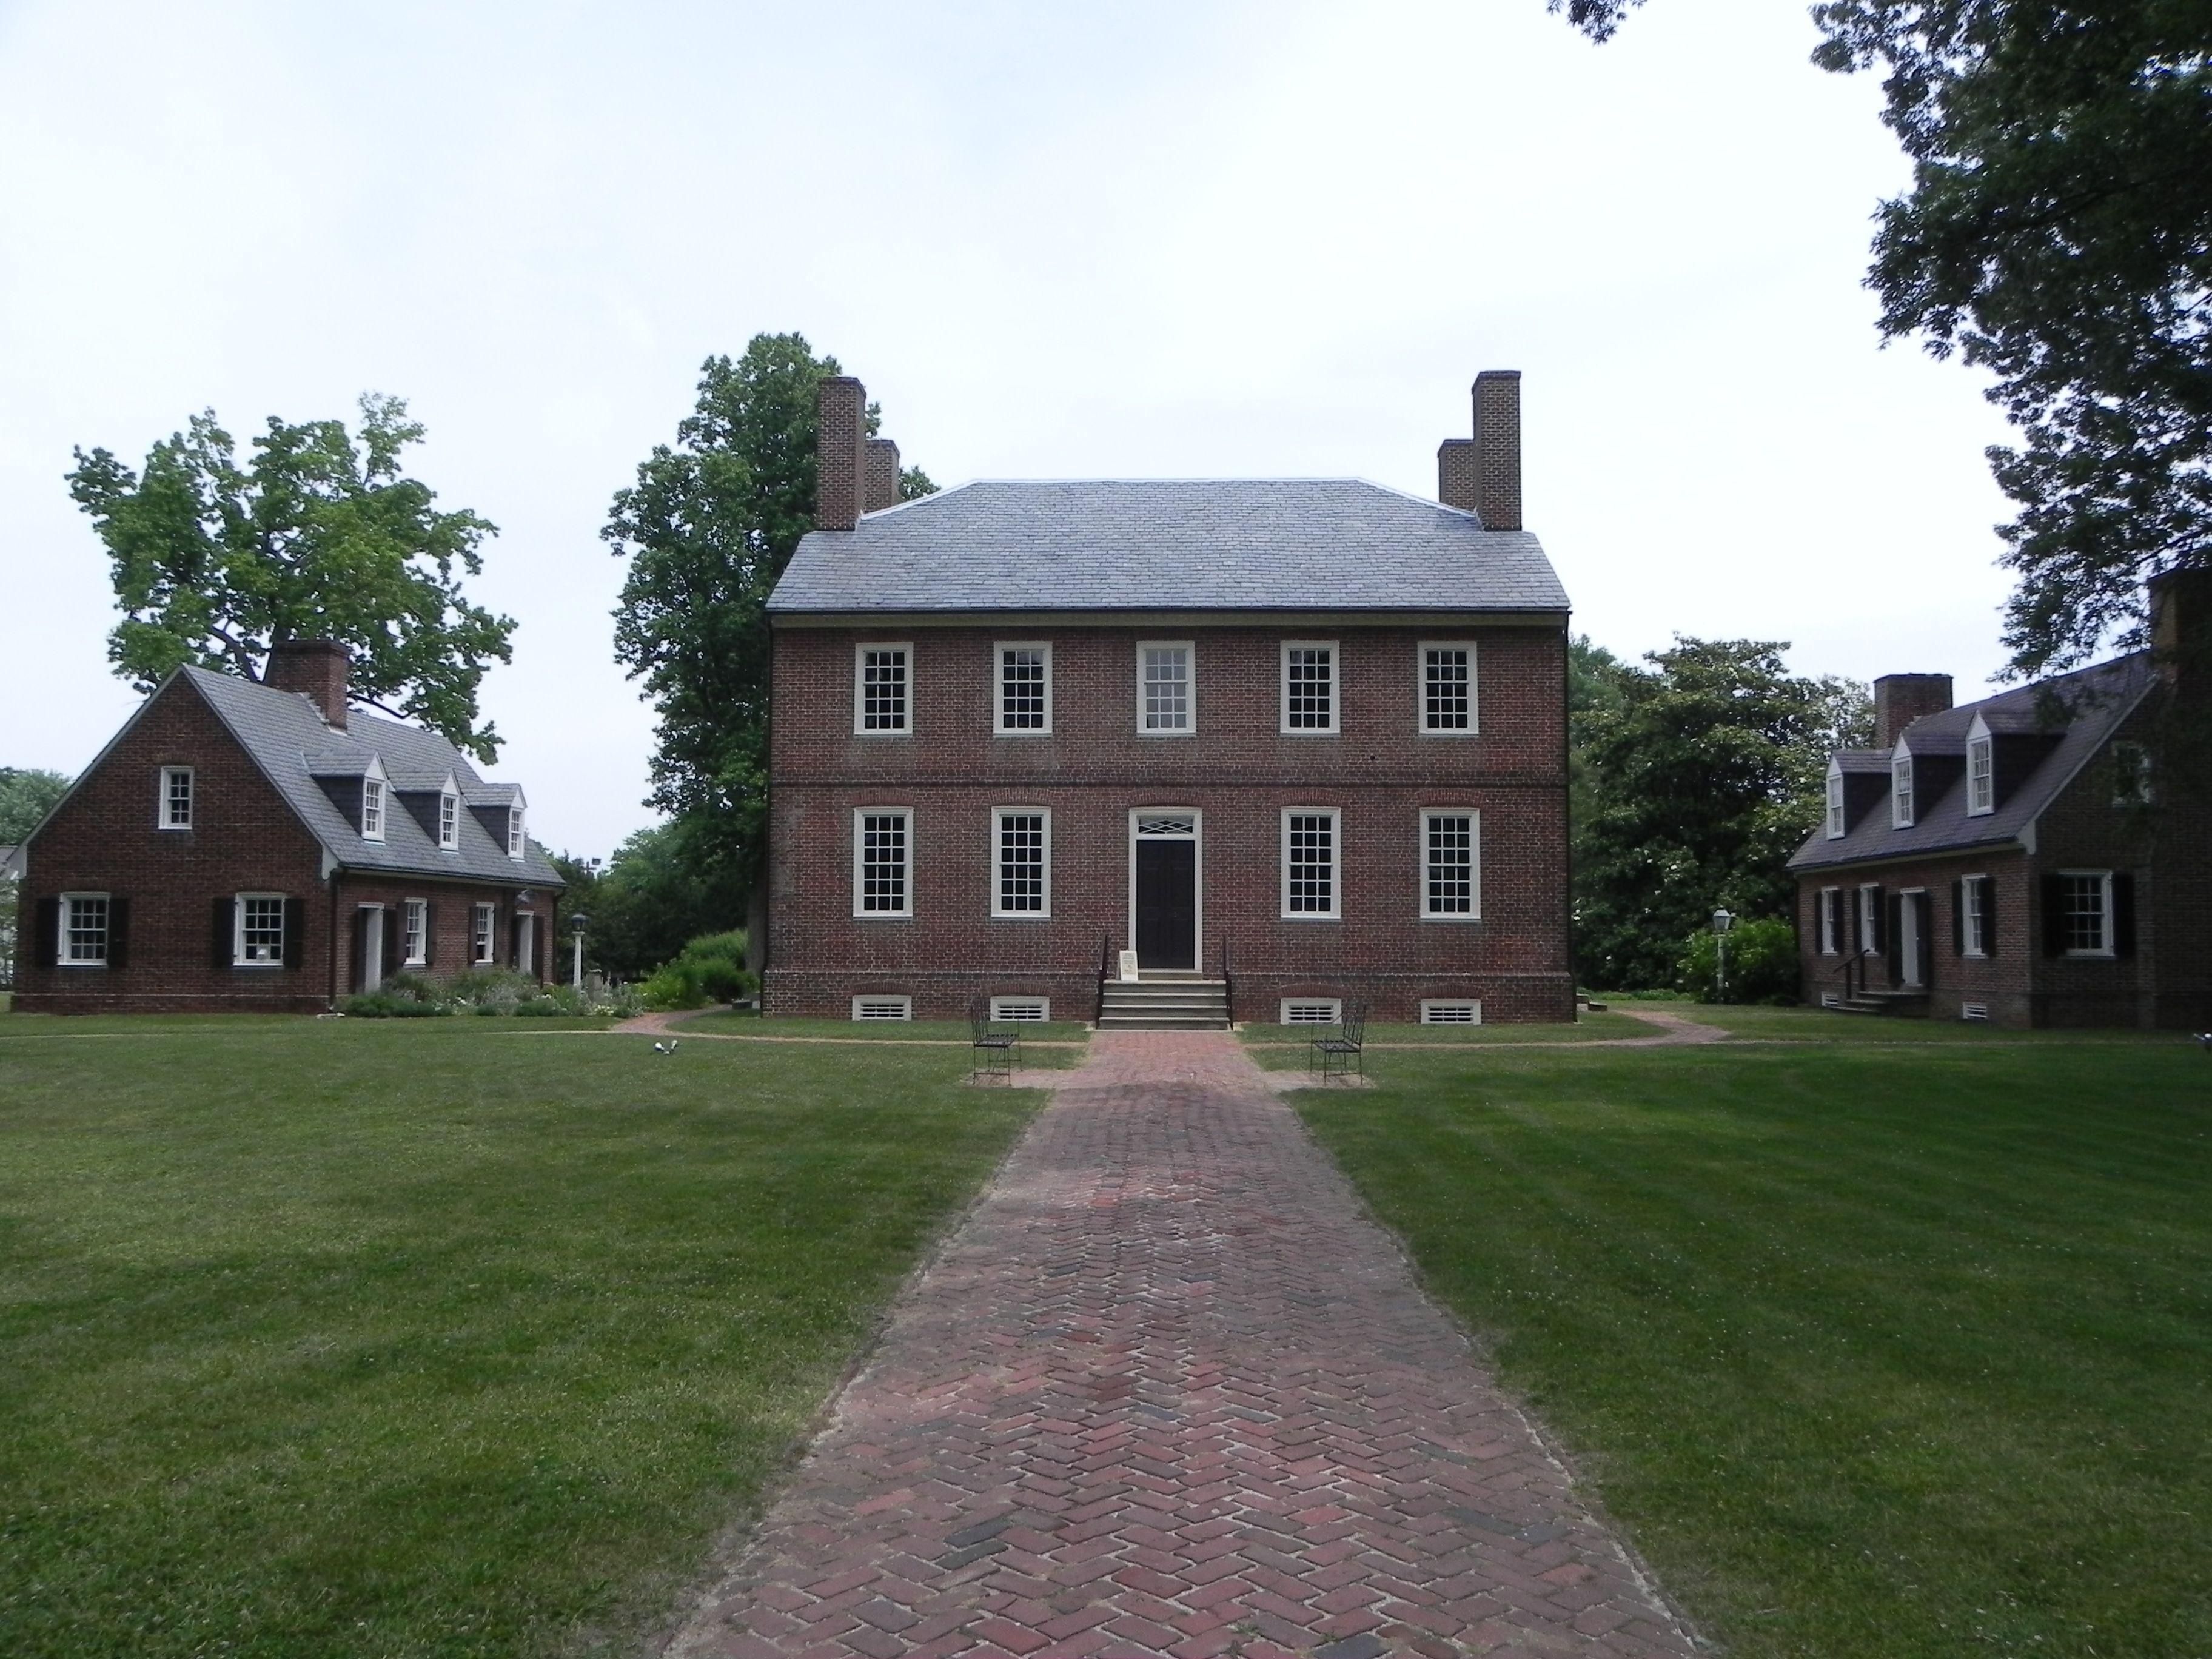 Kenmore Fredericksburg 1774 1776 Historic Homes Historic Buildings Fredericksburg